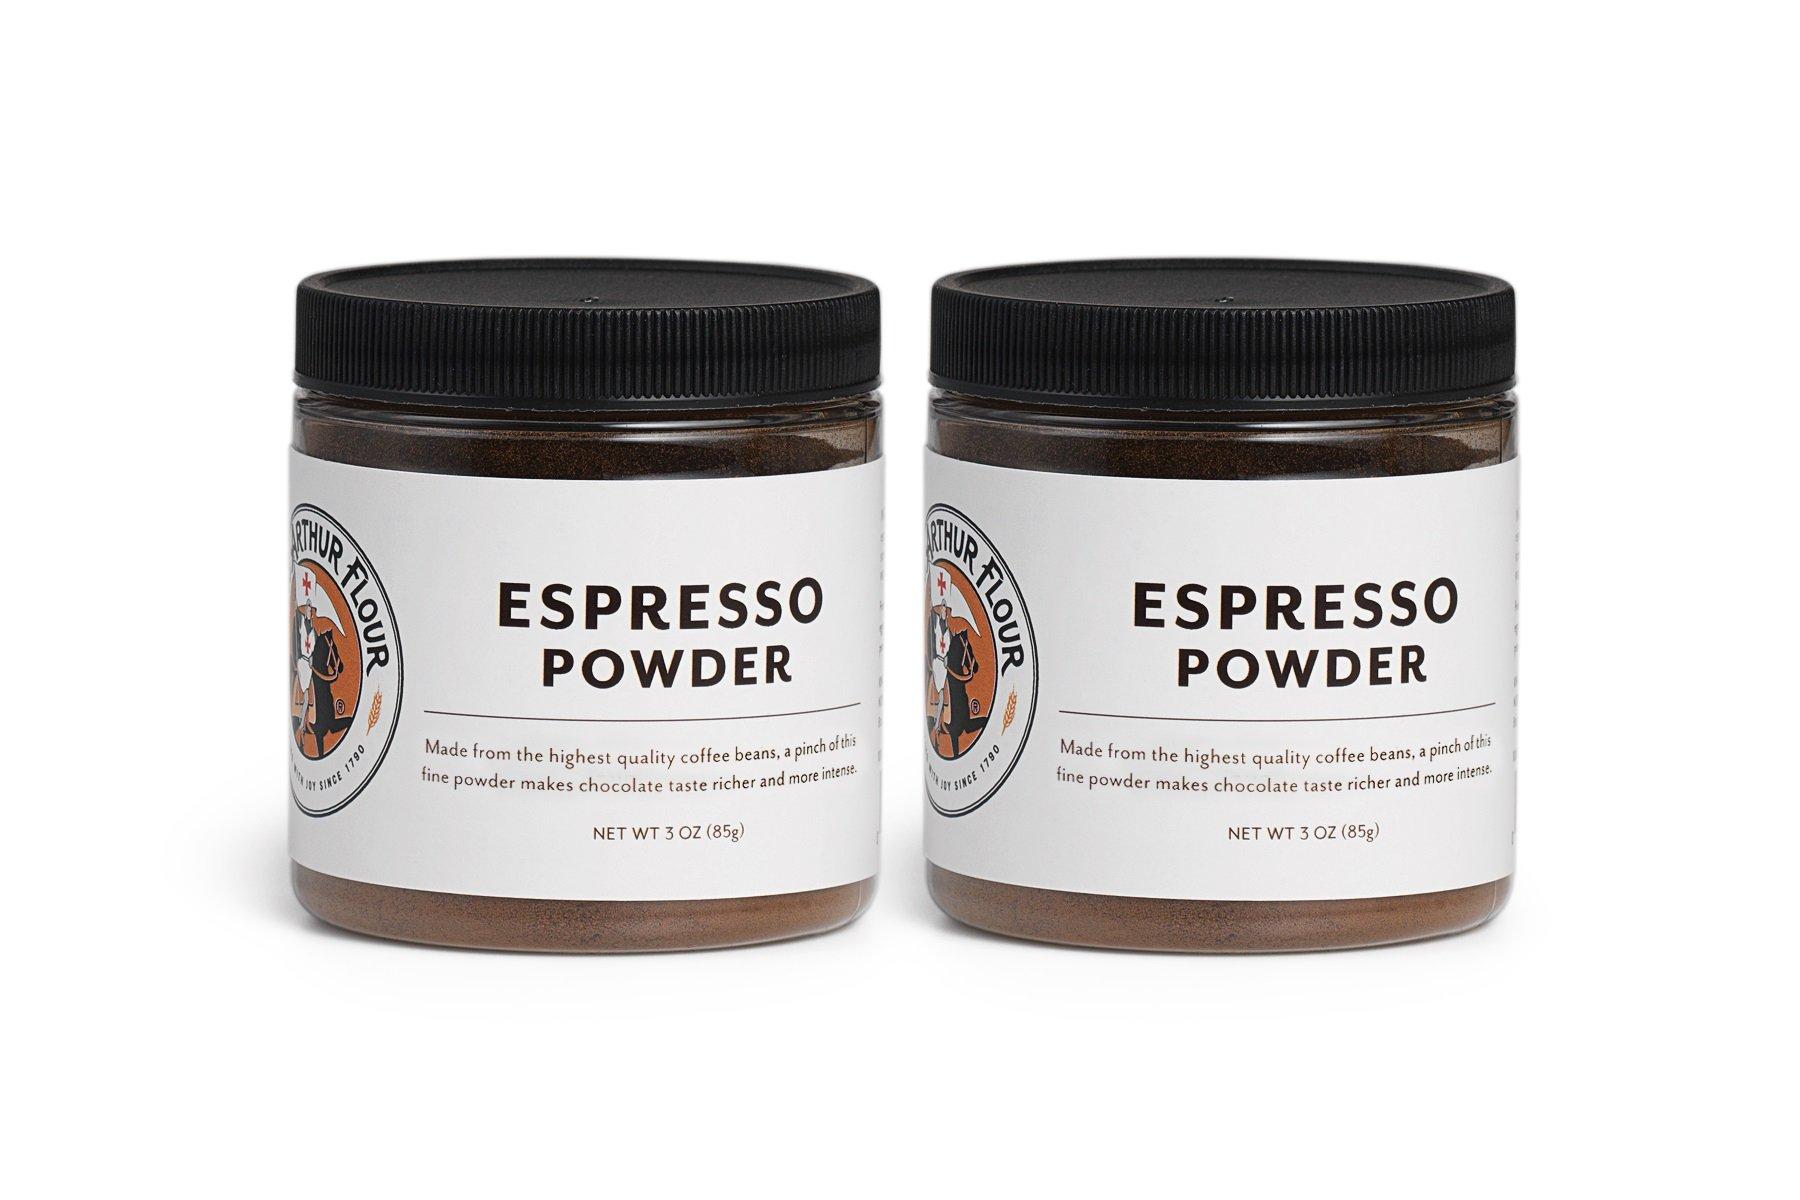 King Arthur Flour Espresso Powder, 3oz, 2 Count